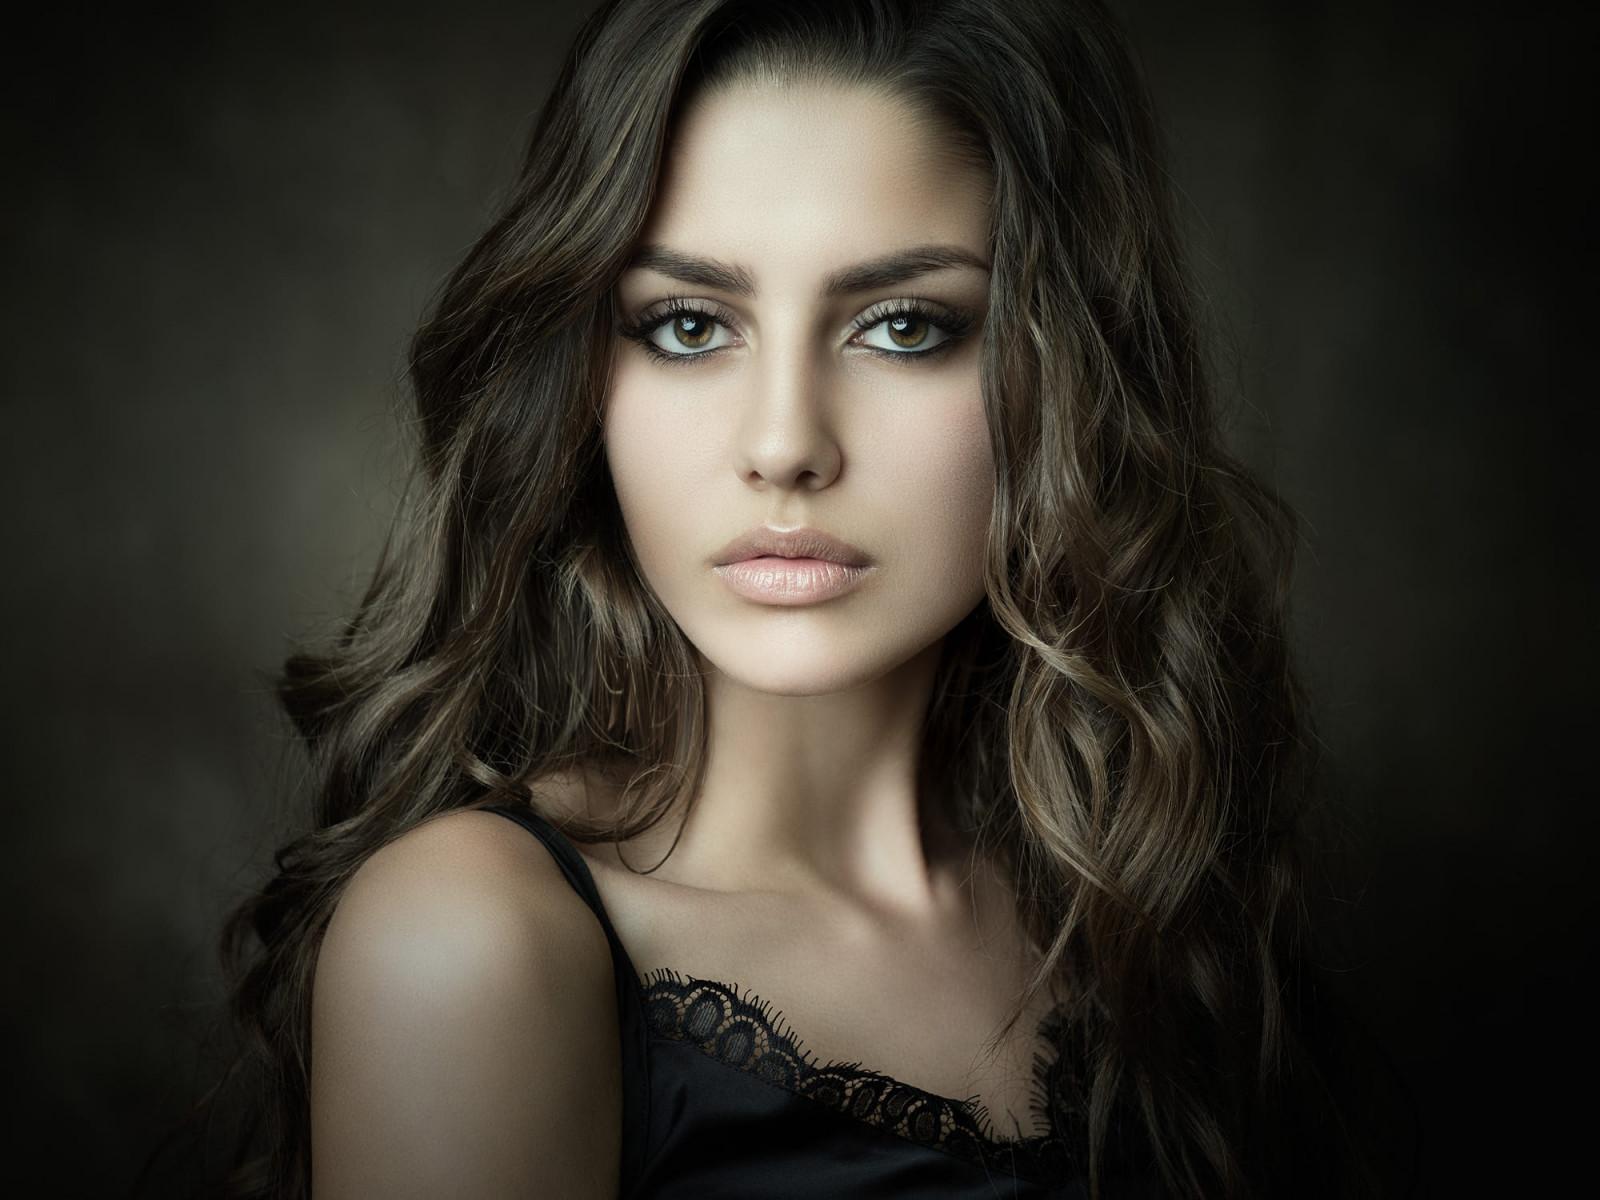 Wallpaper Face Women Simple Background Long Hair: Wallpaper : Women, Simple Background, Brunette, Long Hair